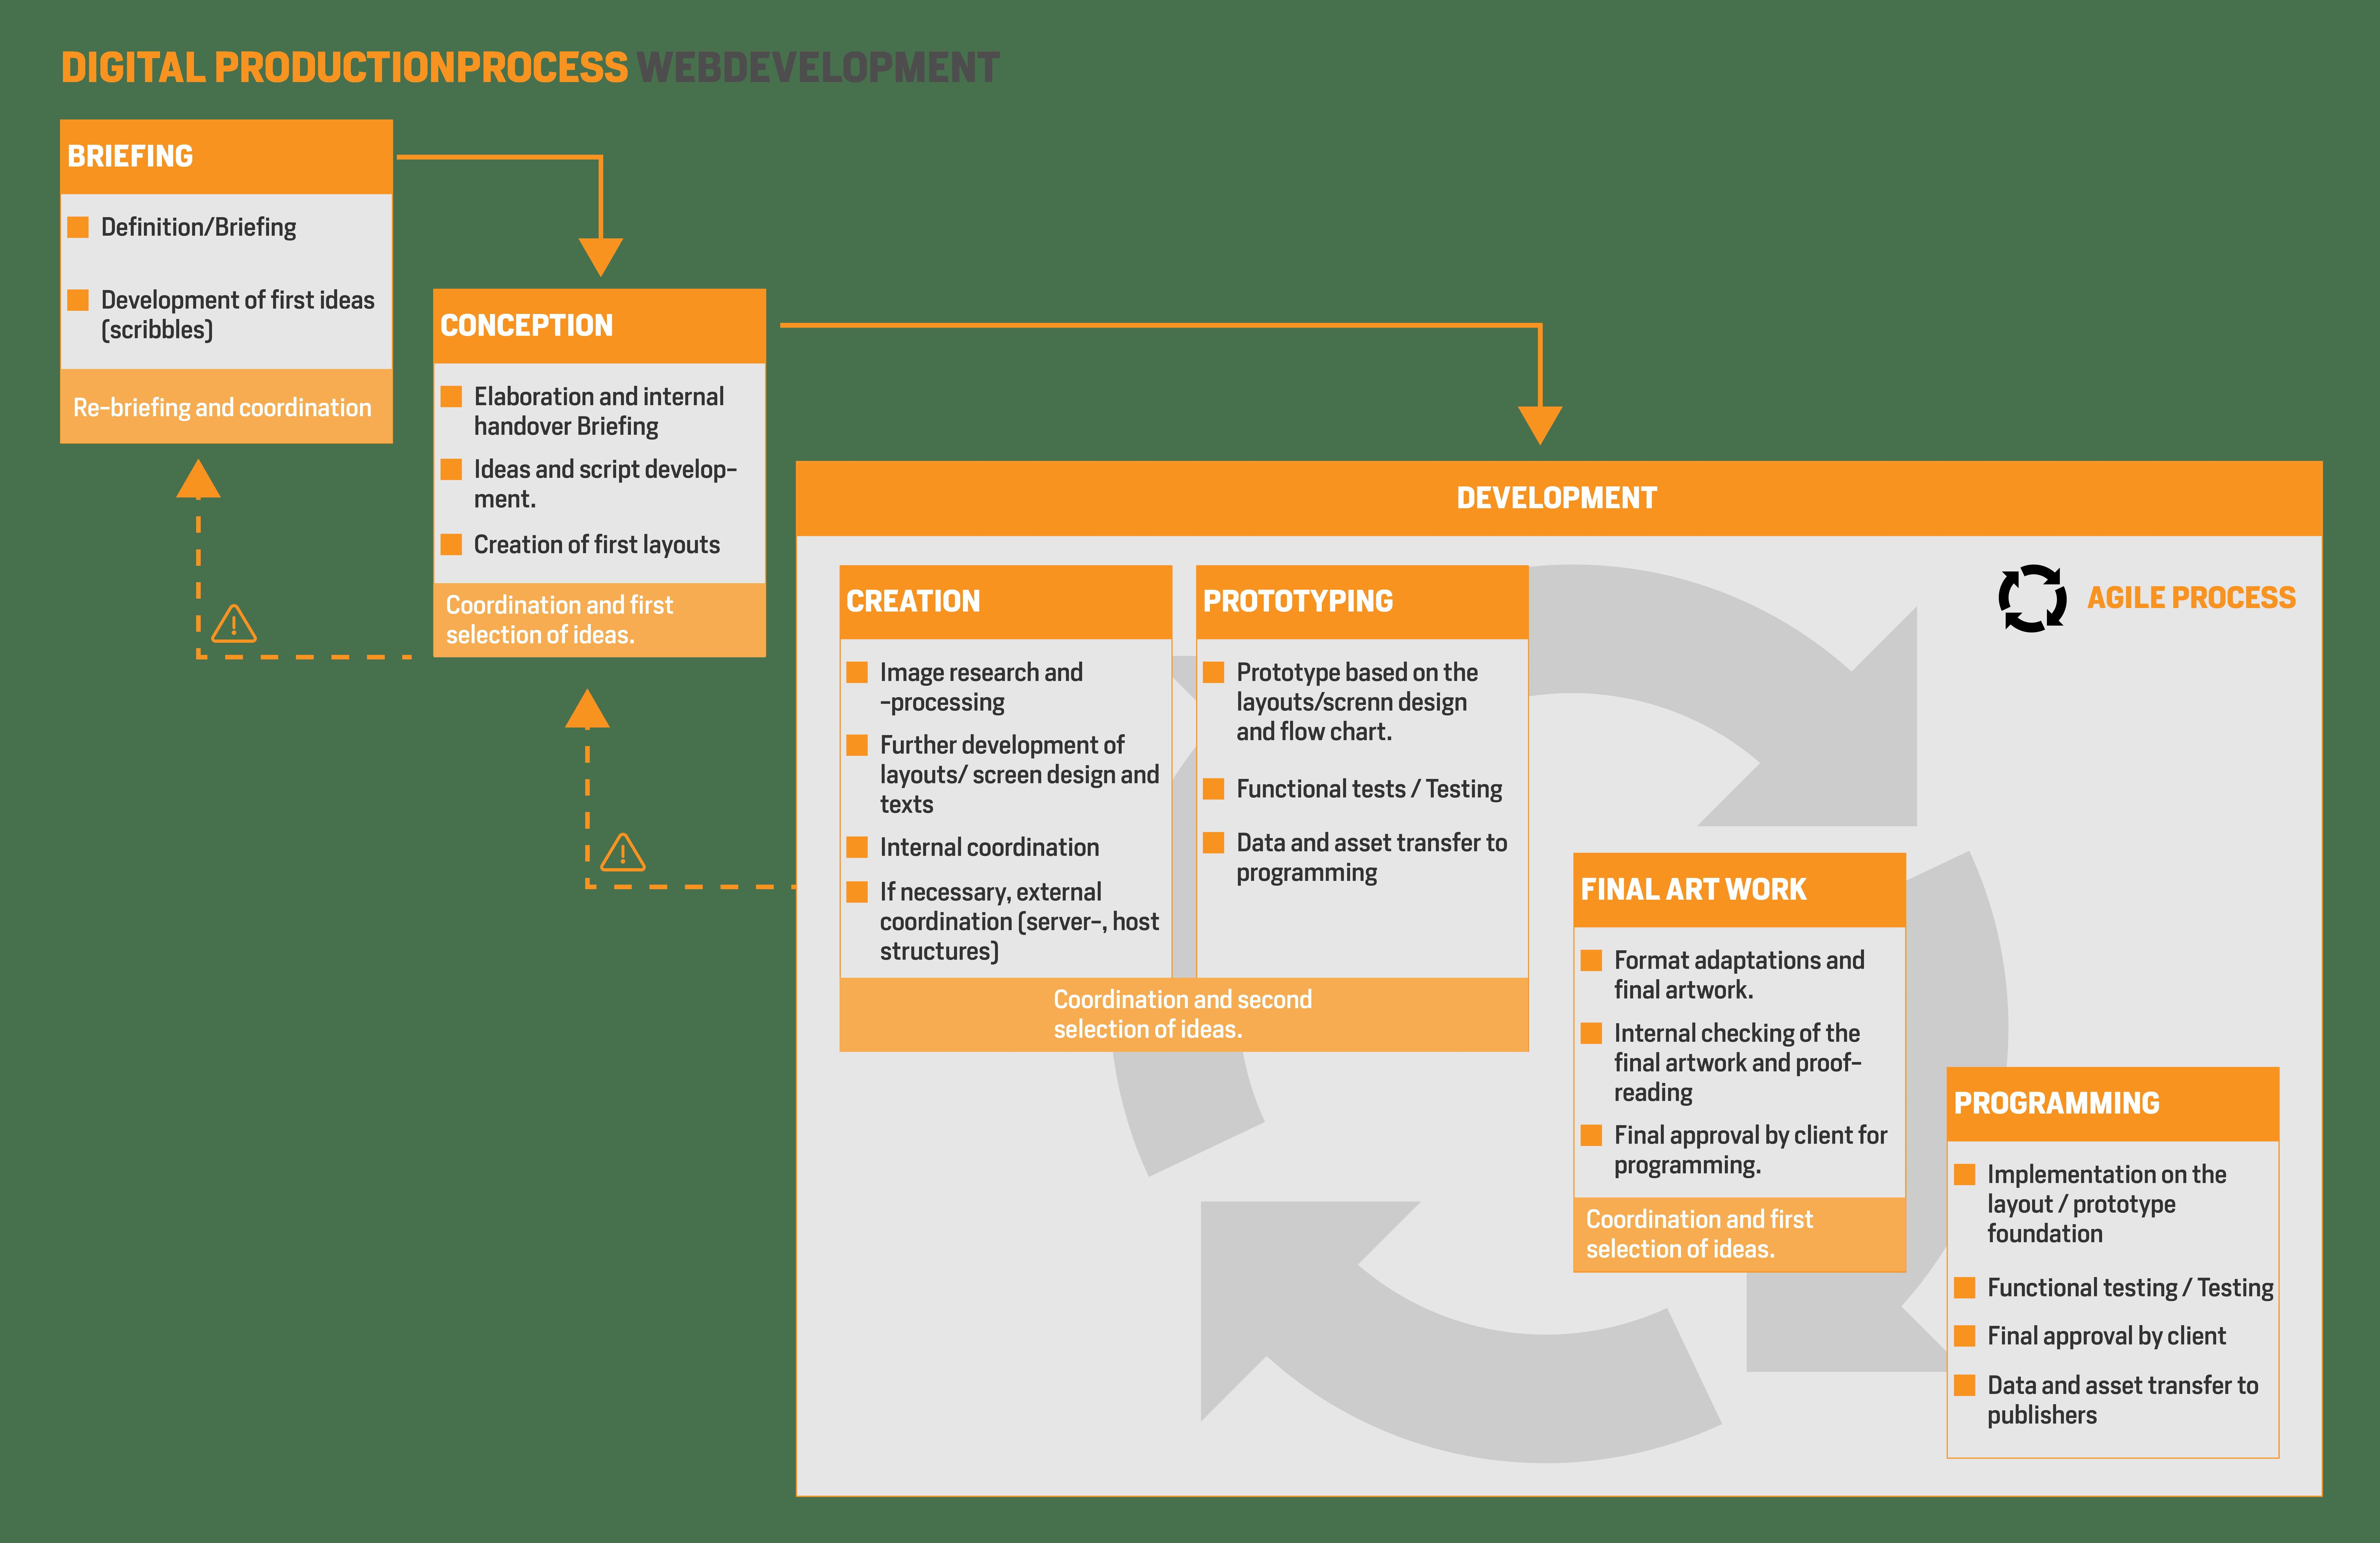 Digital Production process